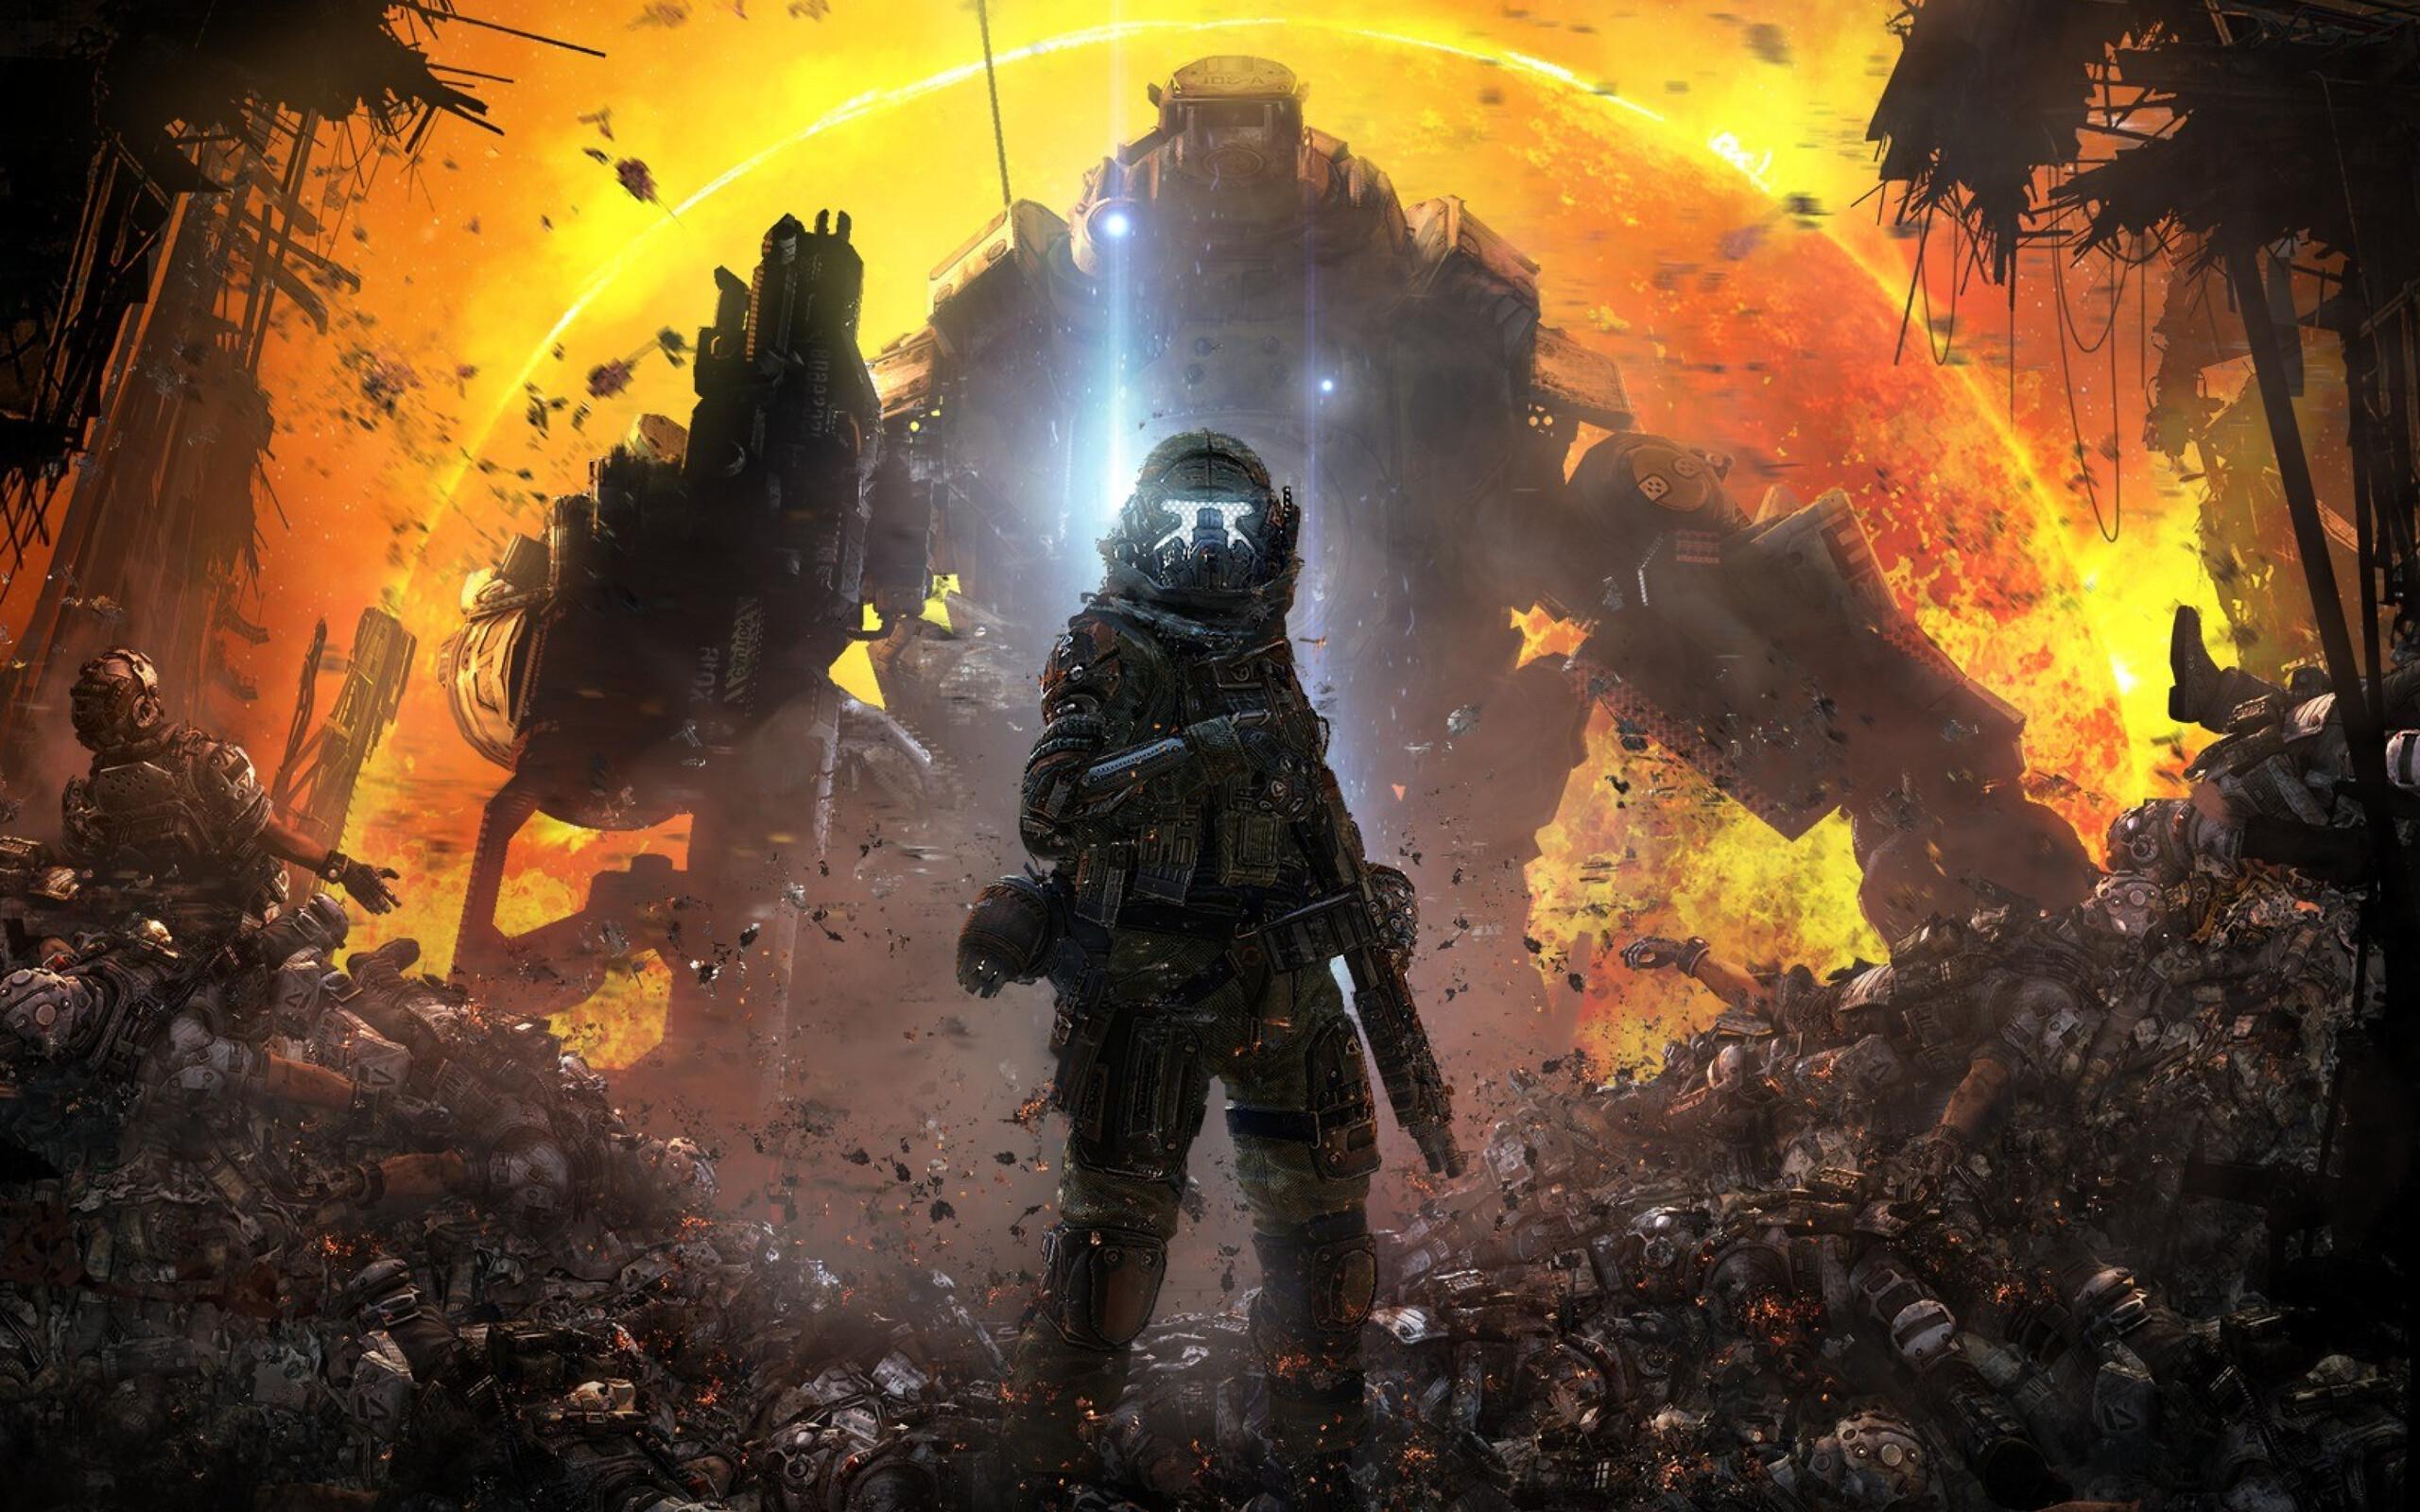 titanfall-2-artwork-4k-pic.jpg